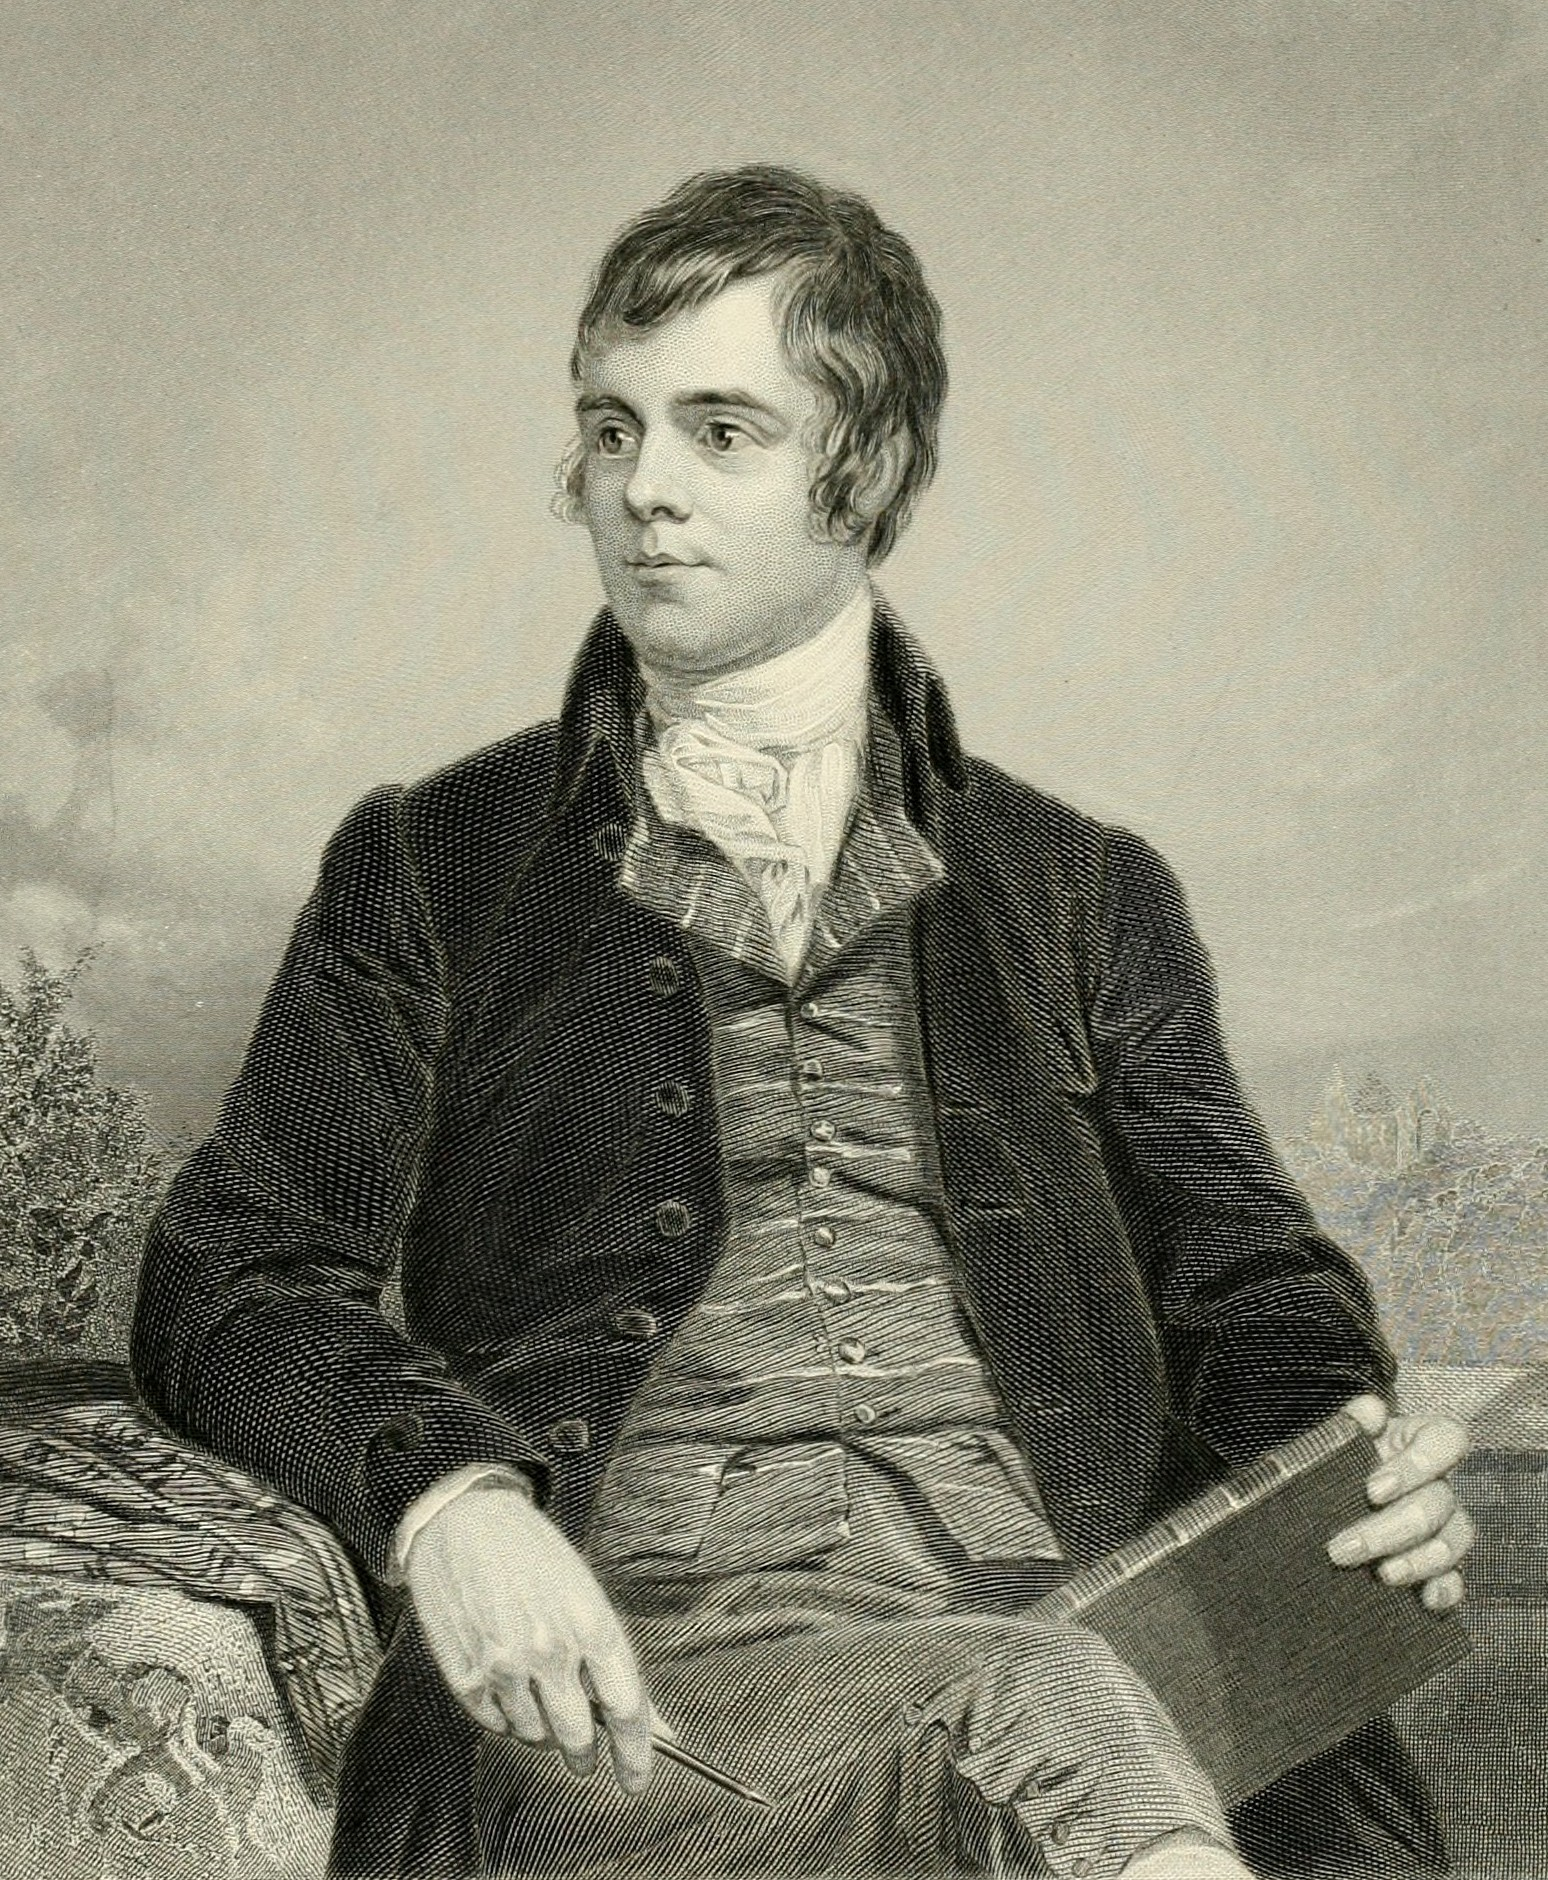 Robert Burns inspired many vernacular writers ...